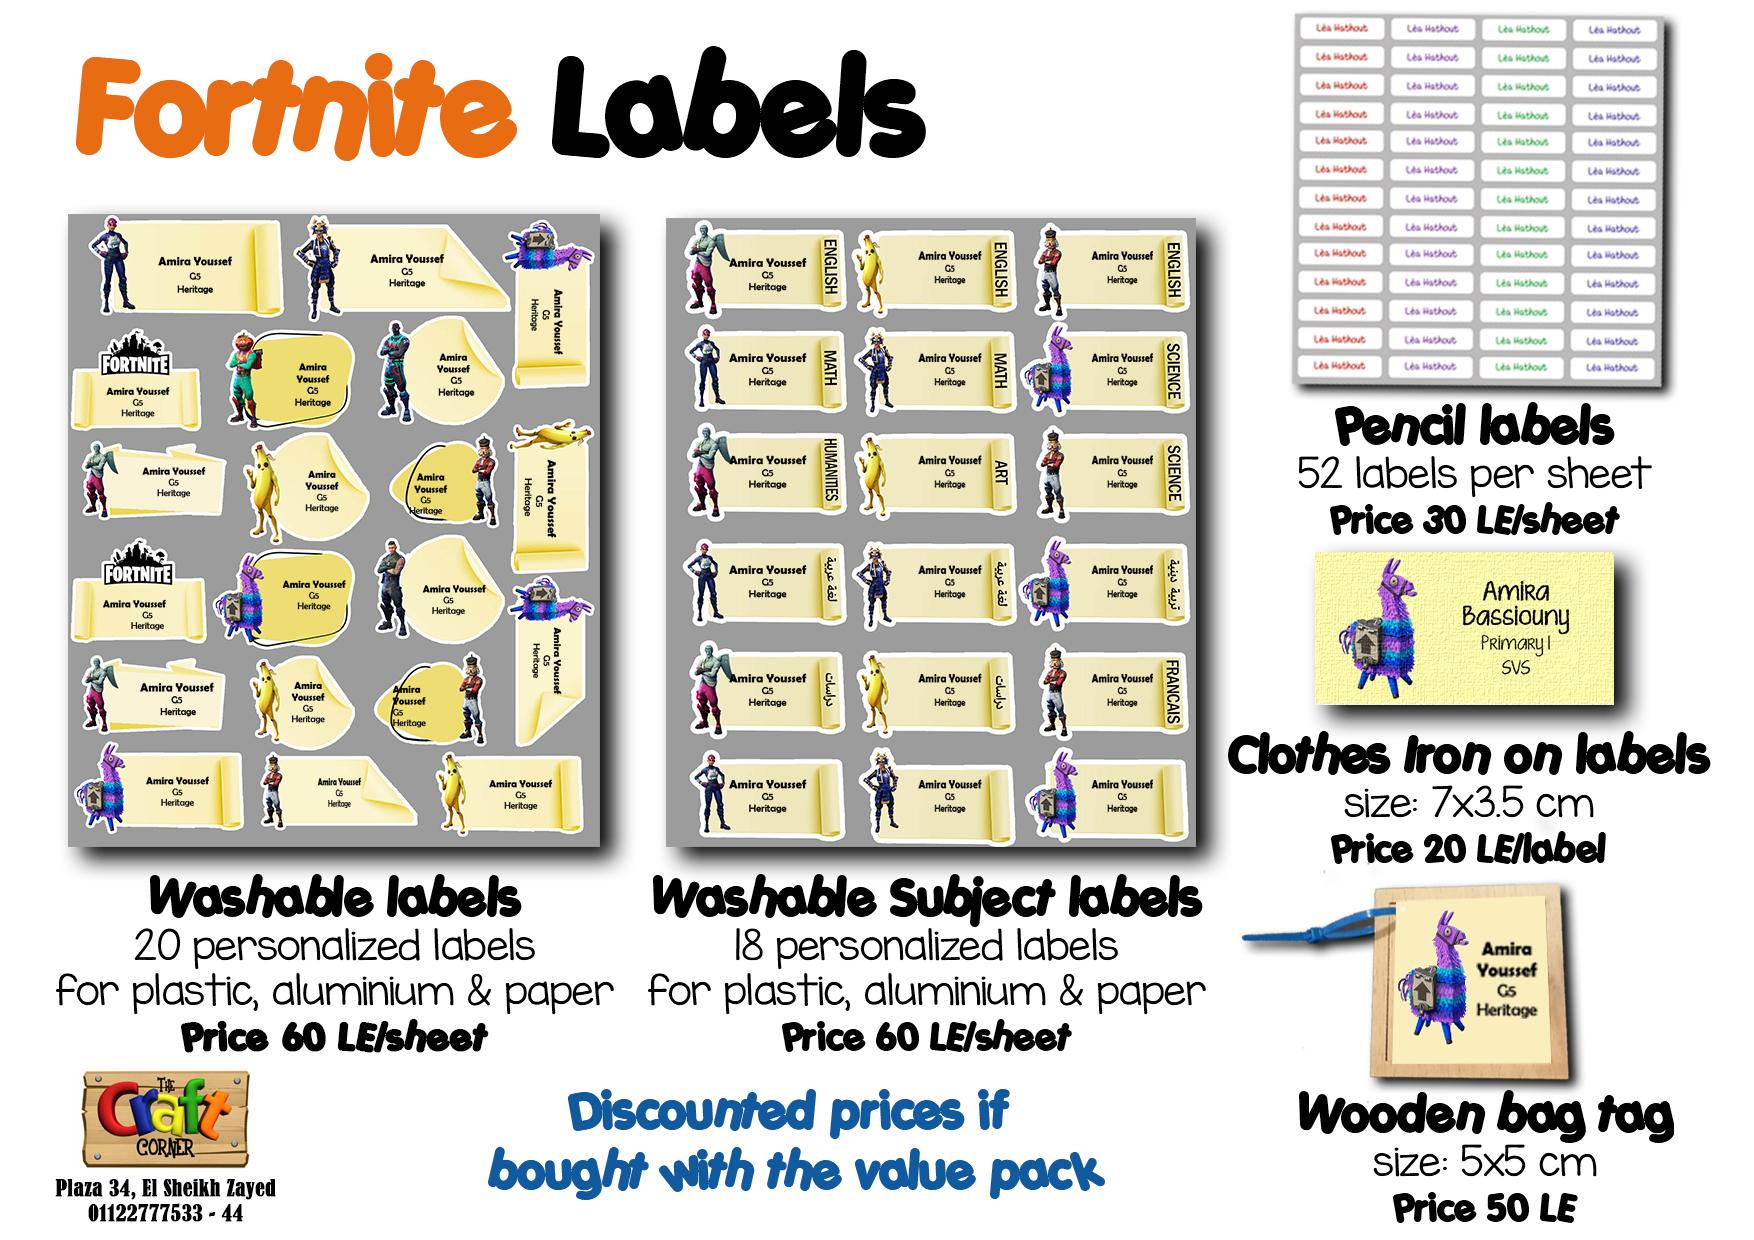 Fortnite Labels